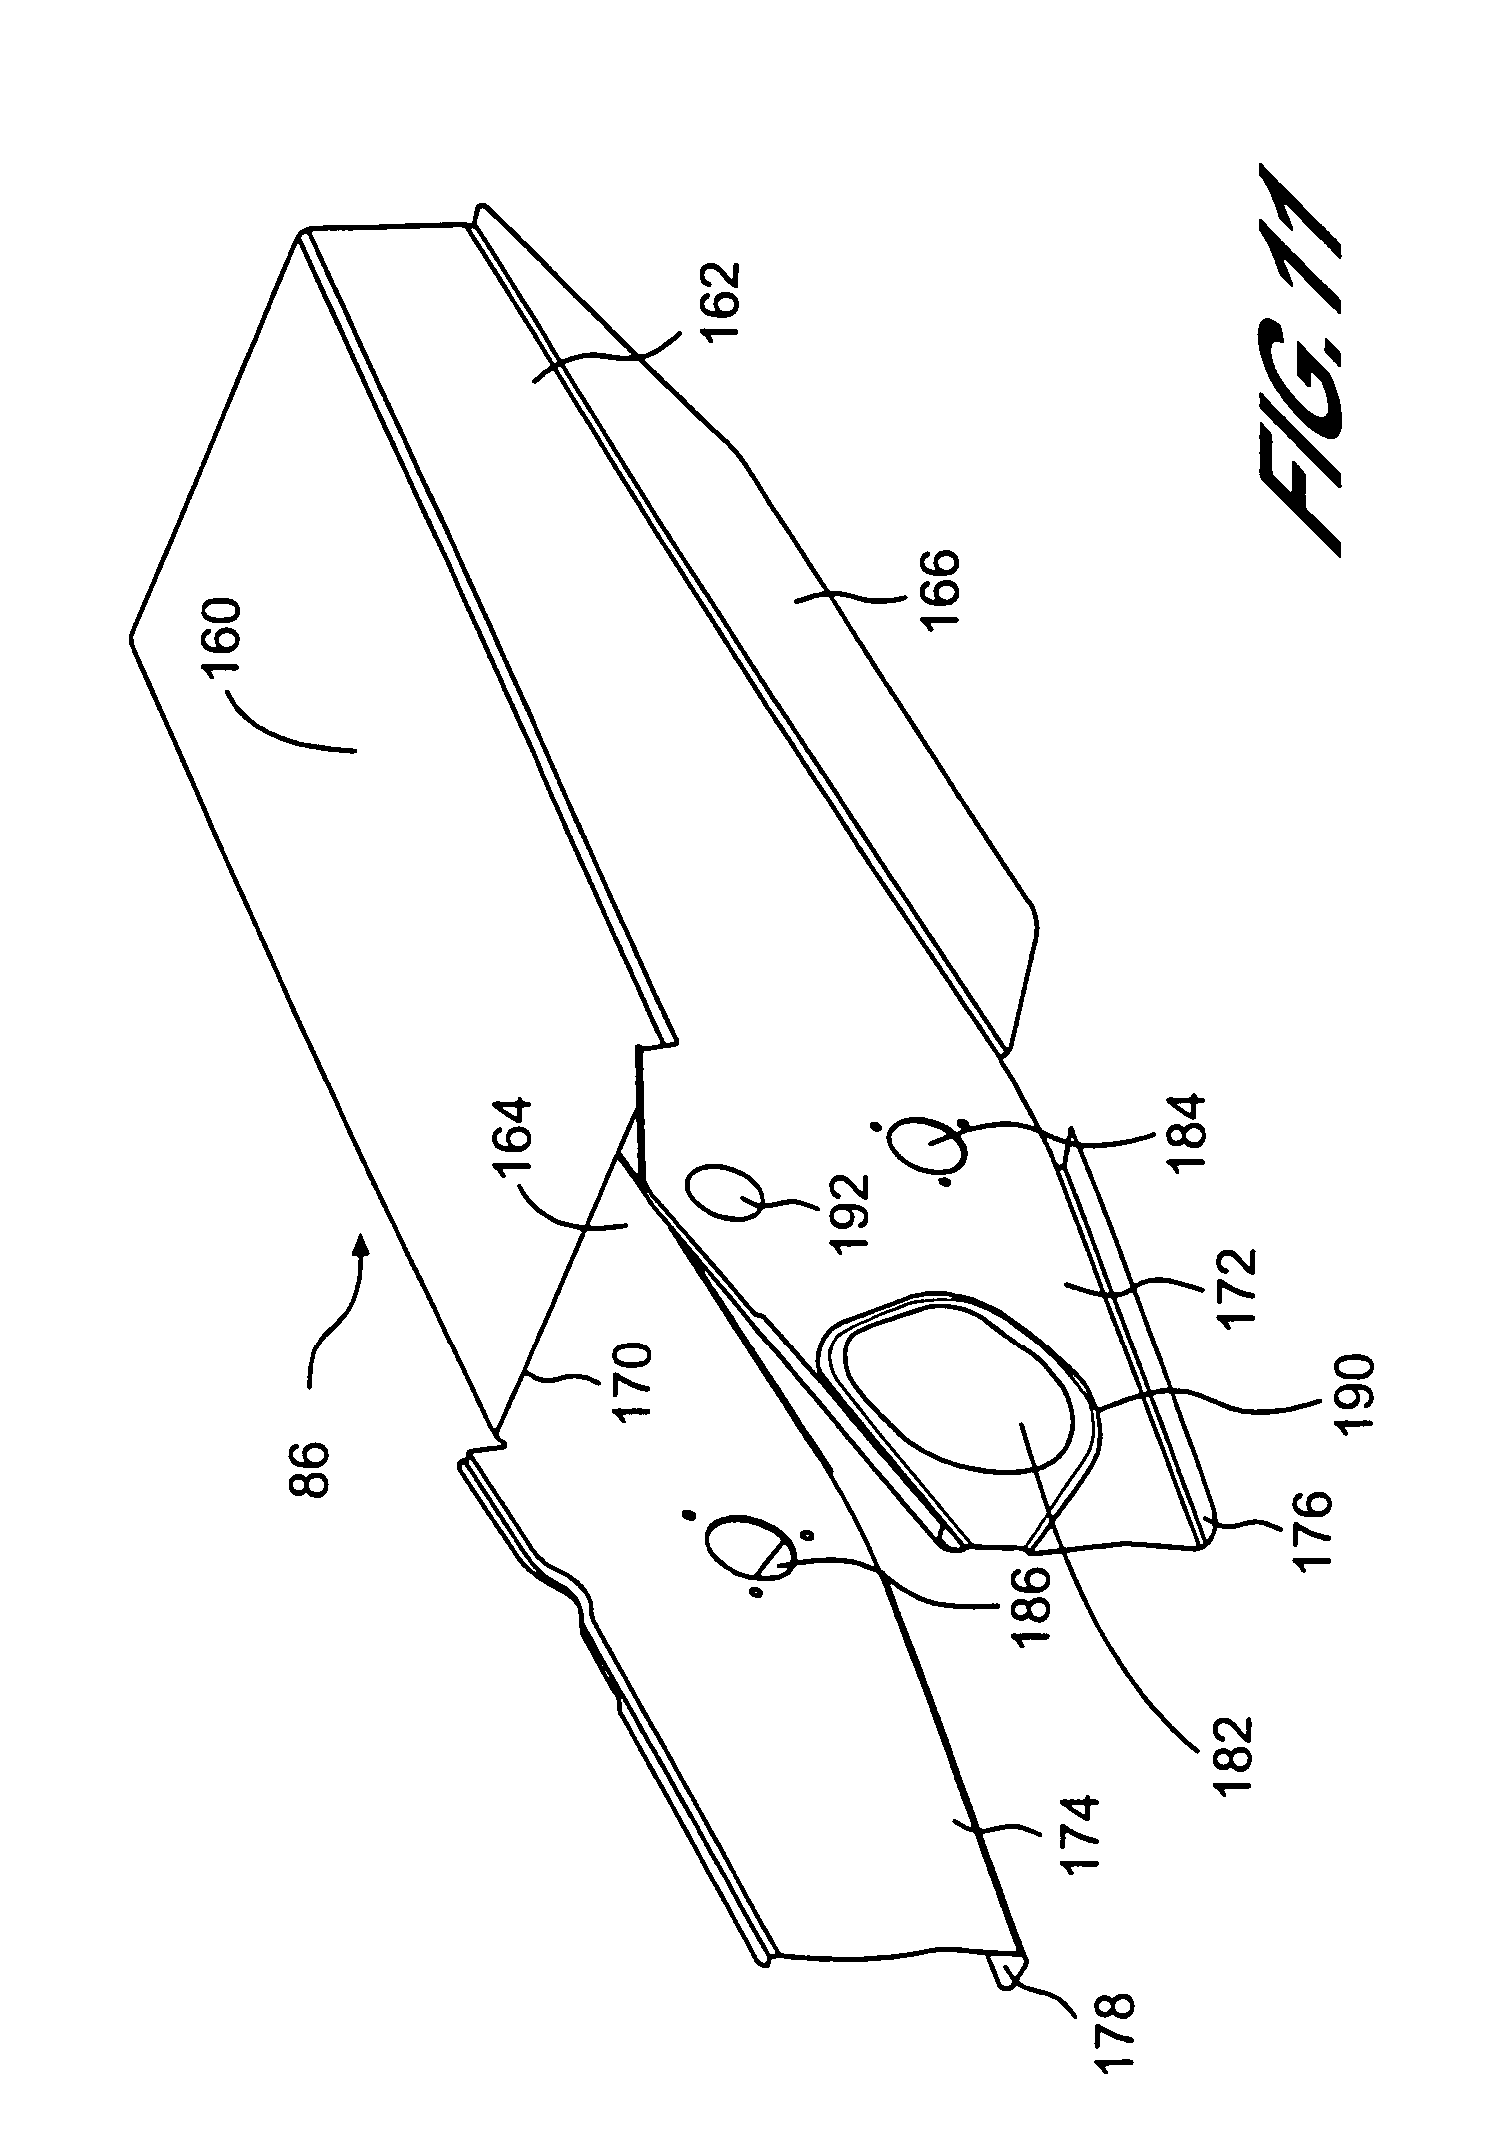 Rodi dpdt relay wiring diagram toyota echo engine parts diagram